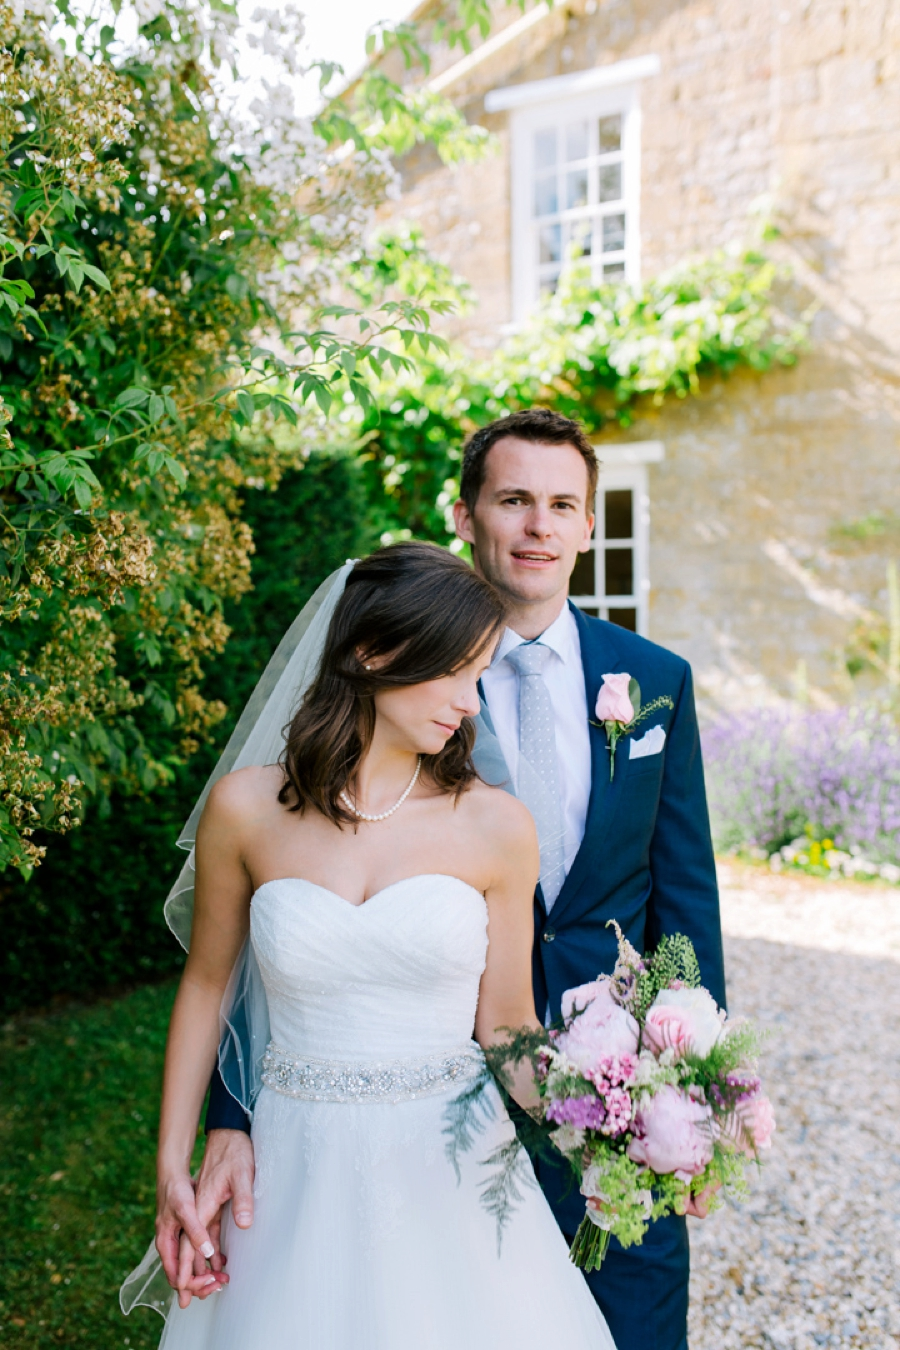 Cheshire Wedding Photographer Huntsham Court Wedding Julie and Chris_0115